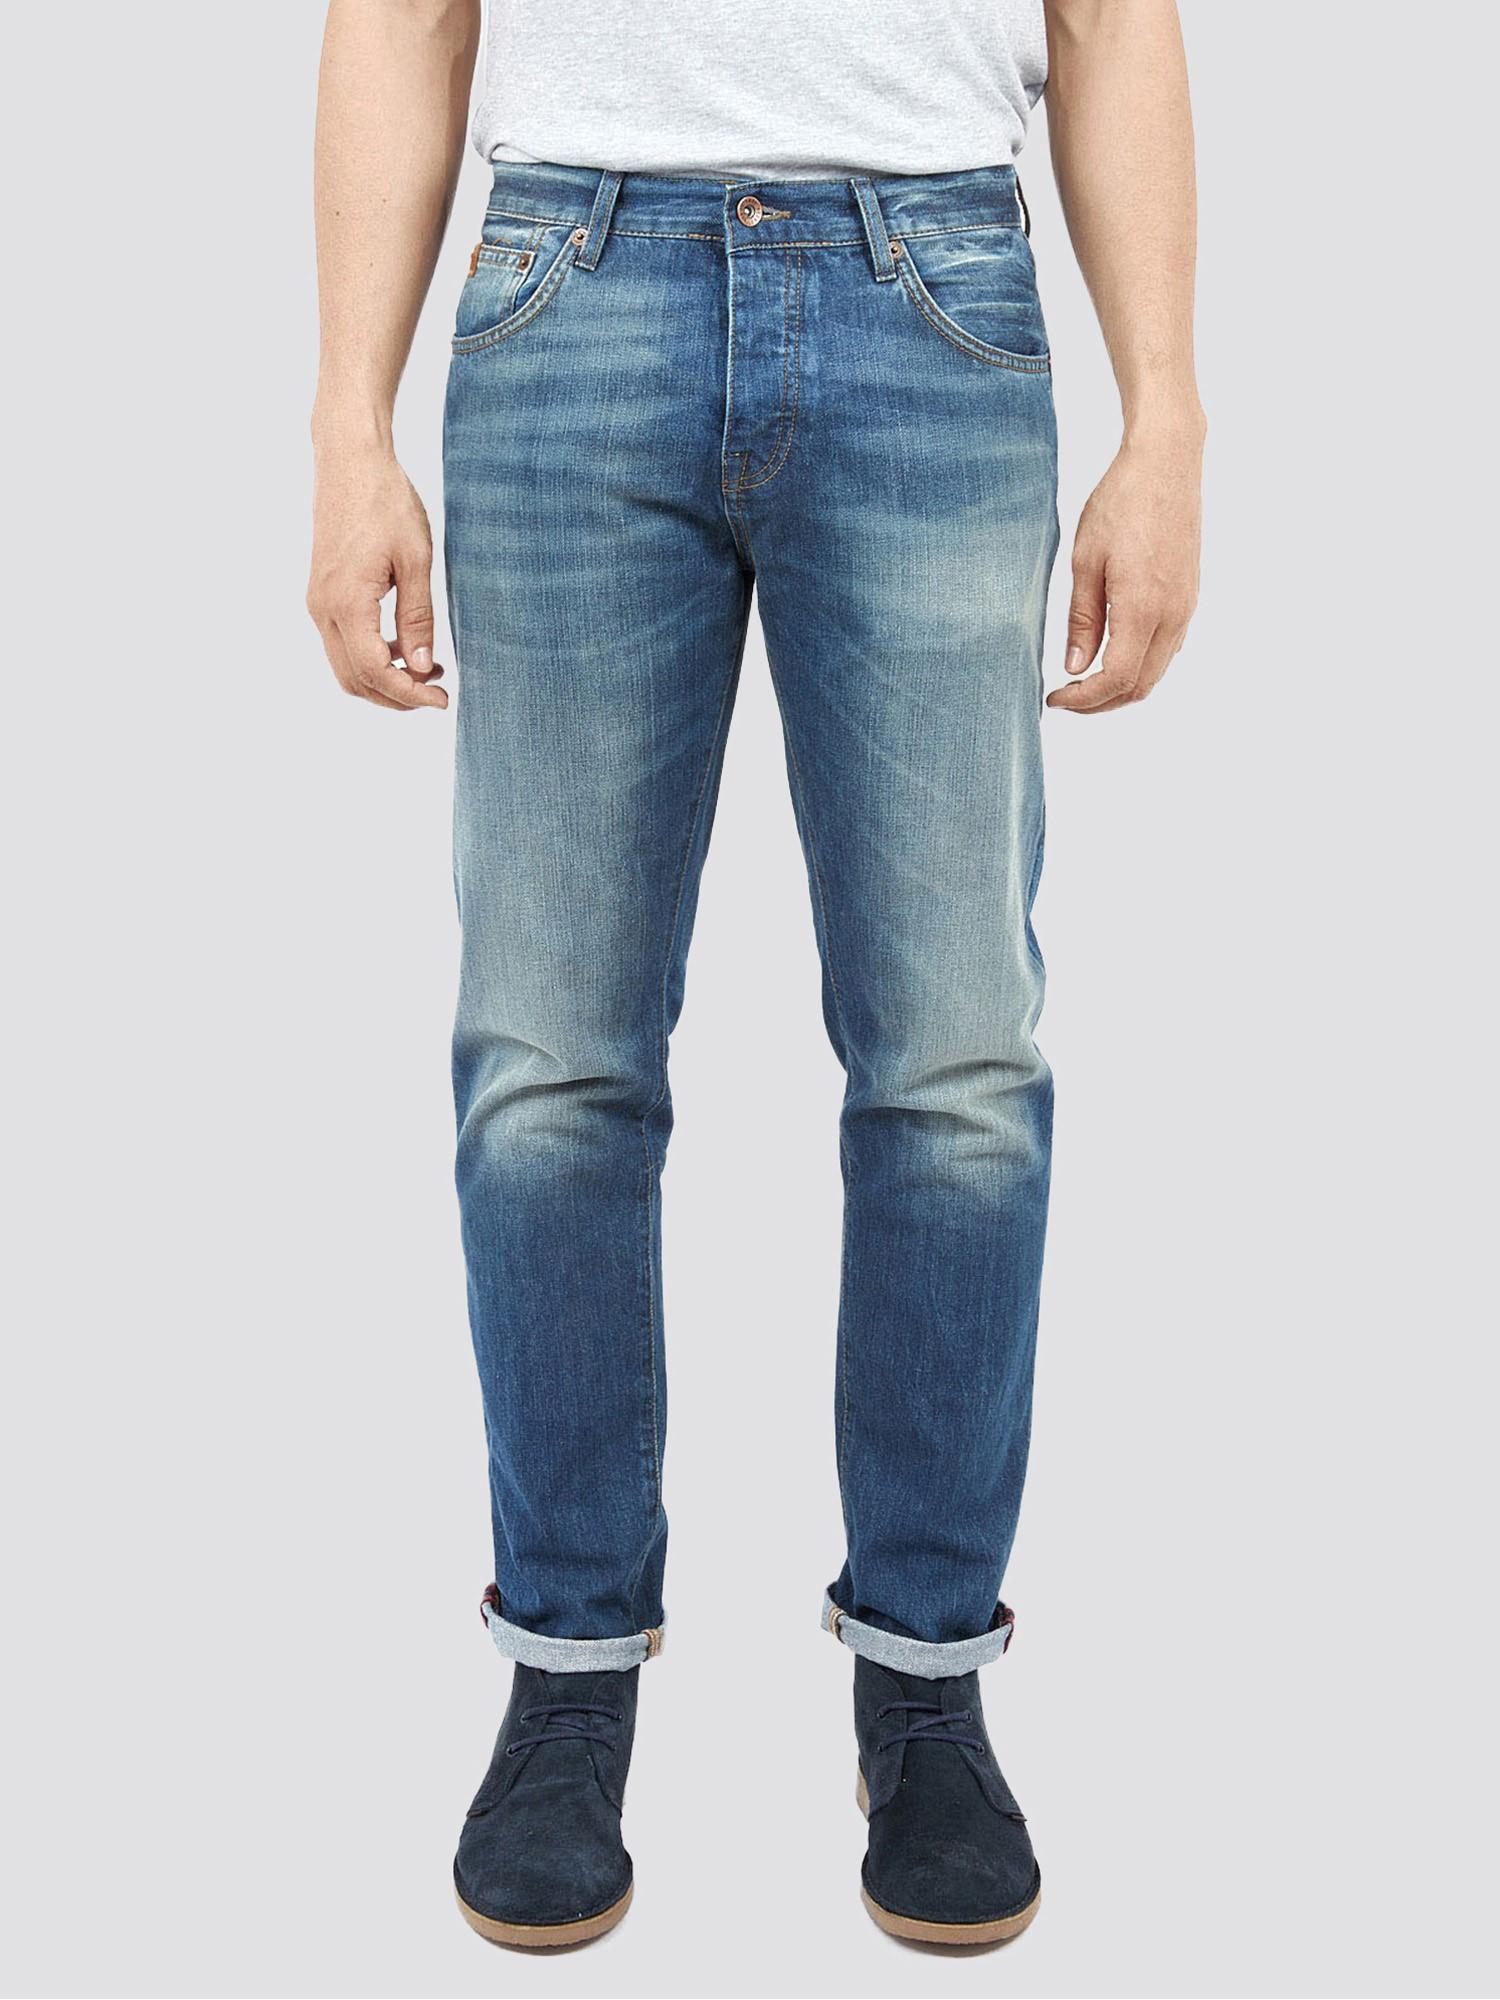 Slim Six Month Vintage Jeans